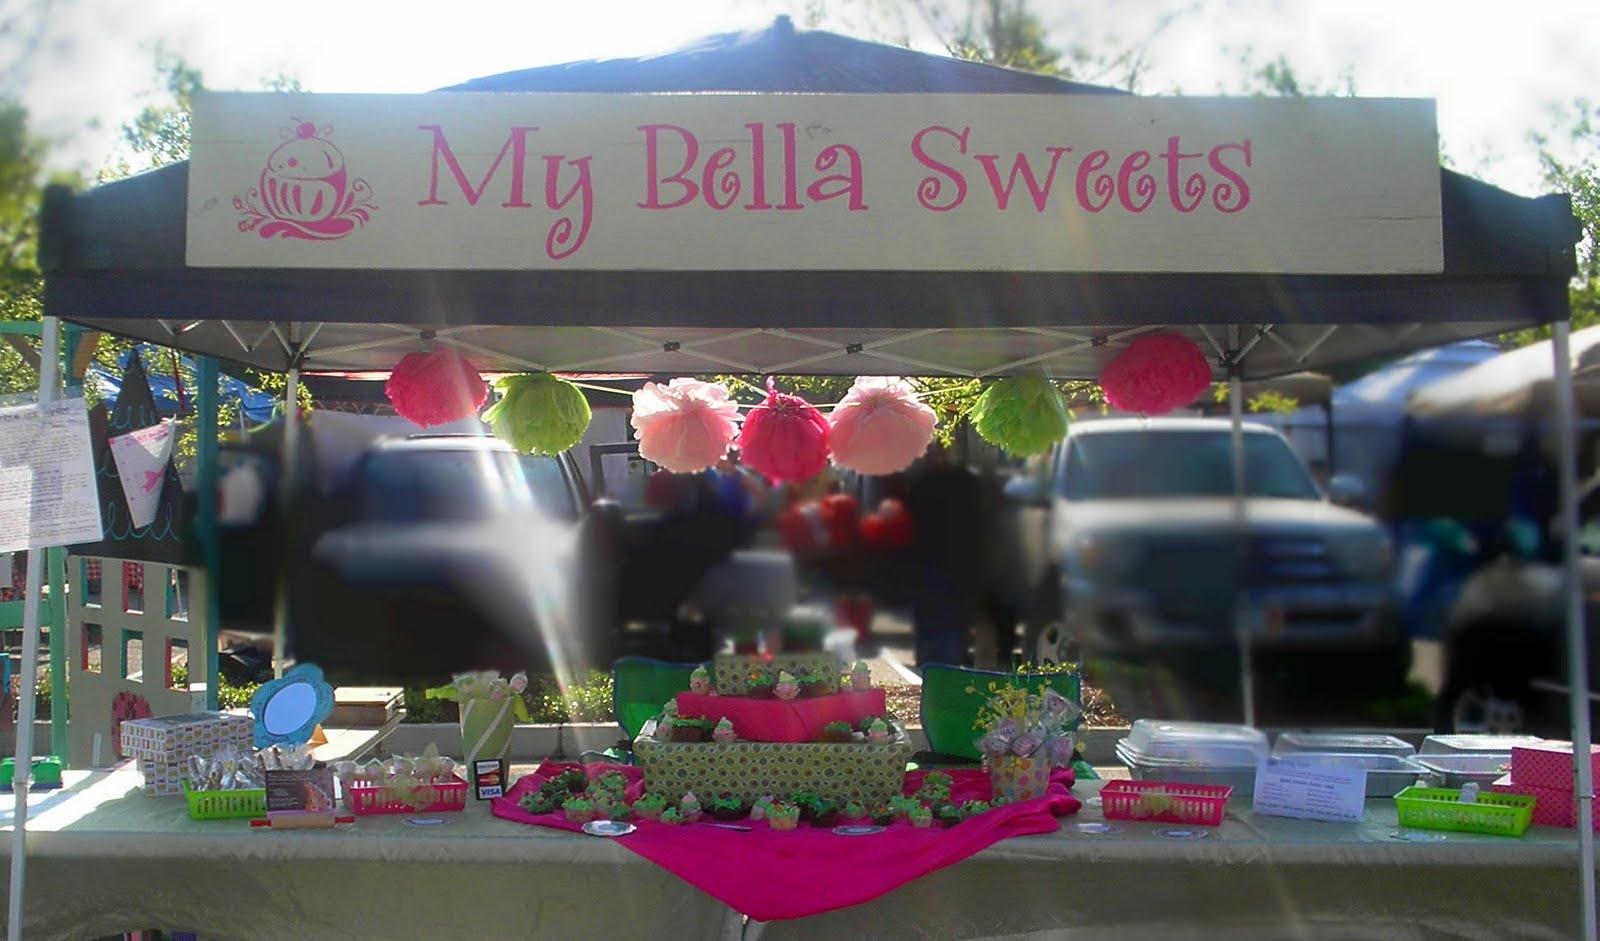 My Bella Sweets